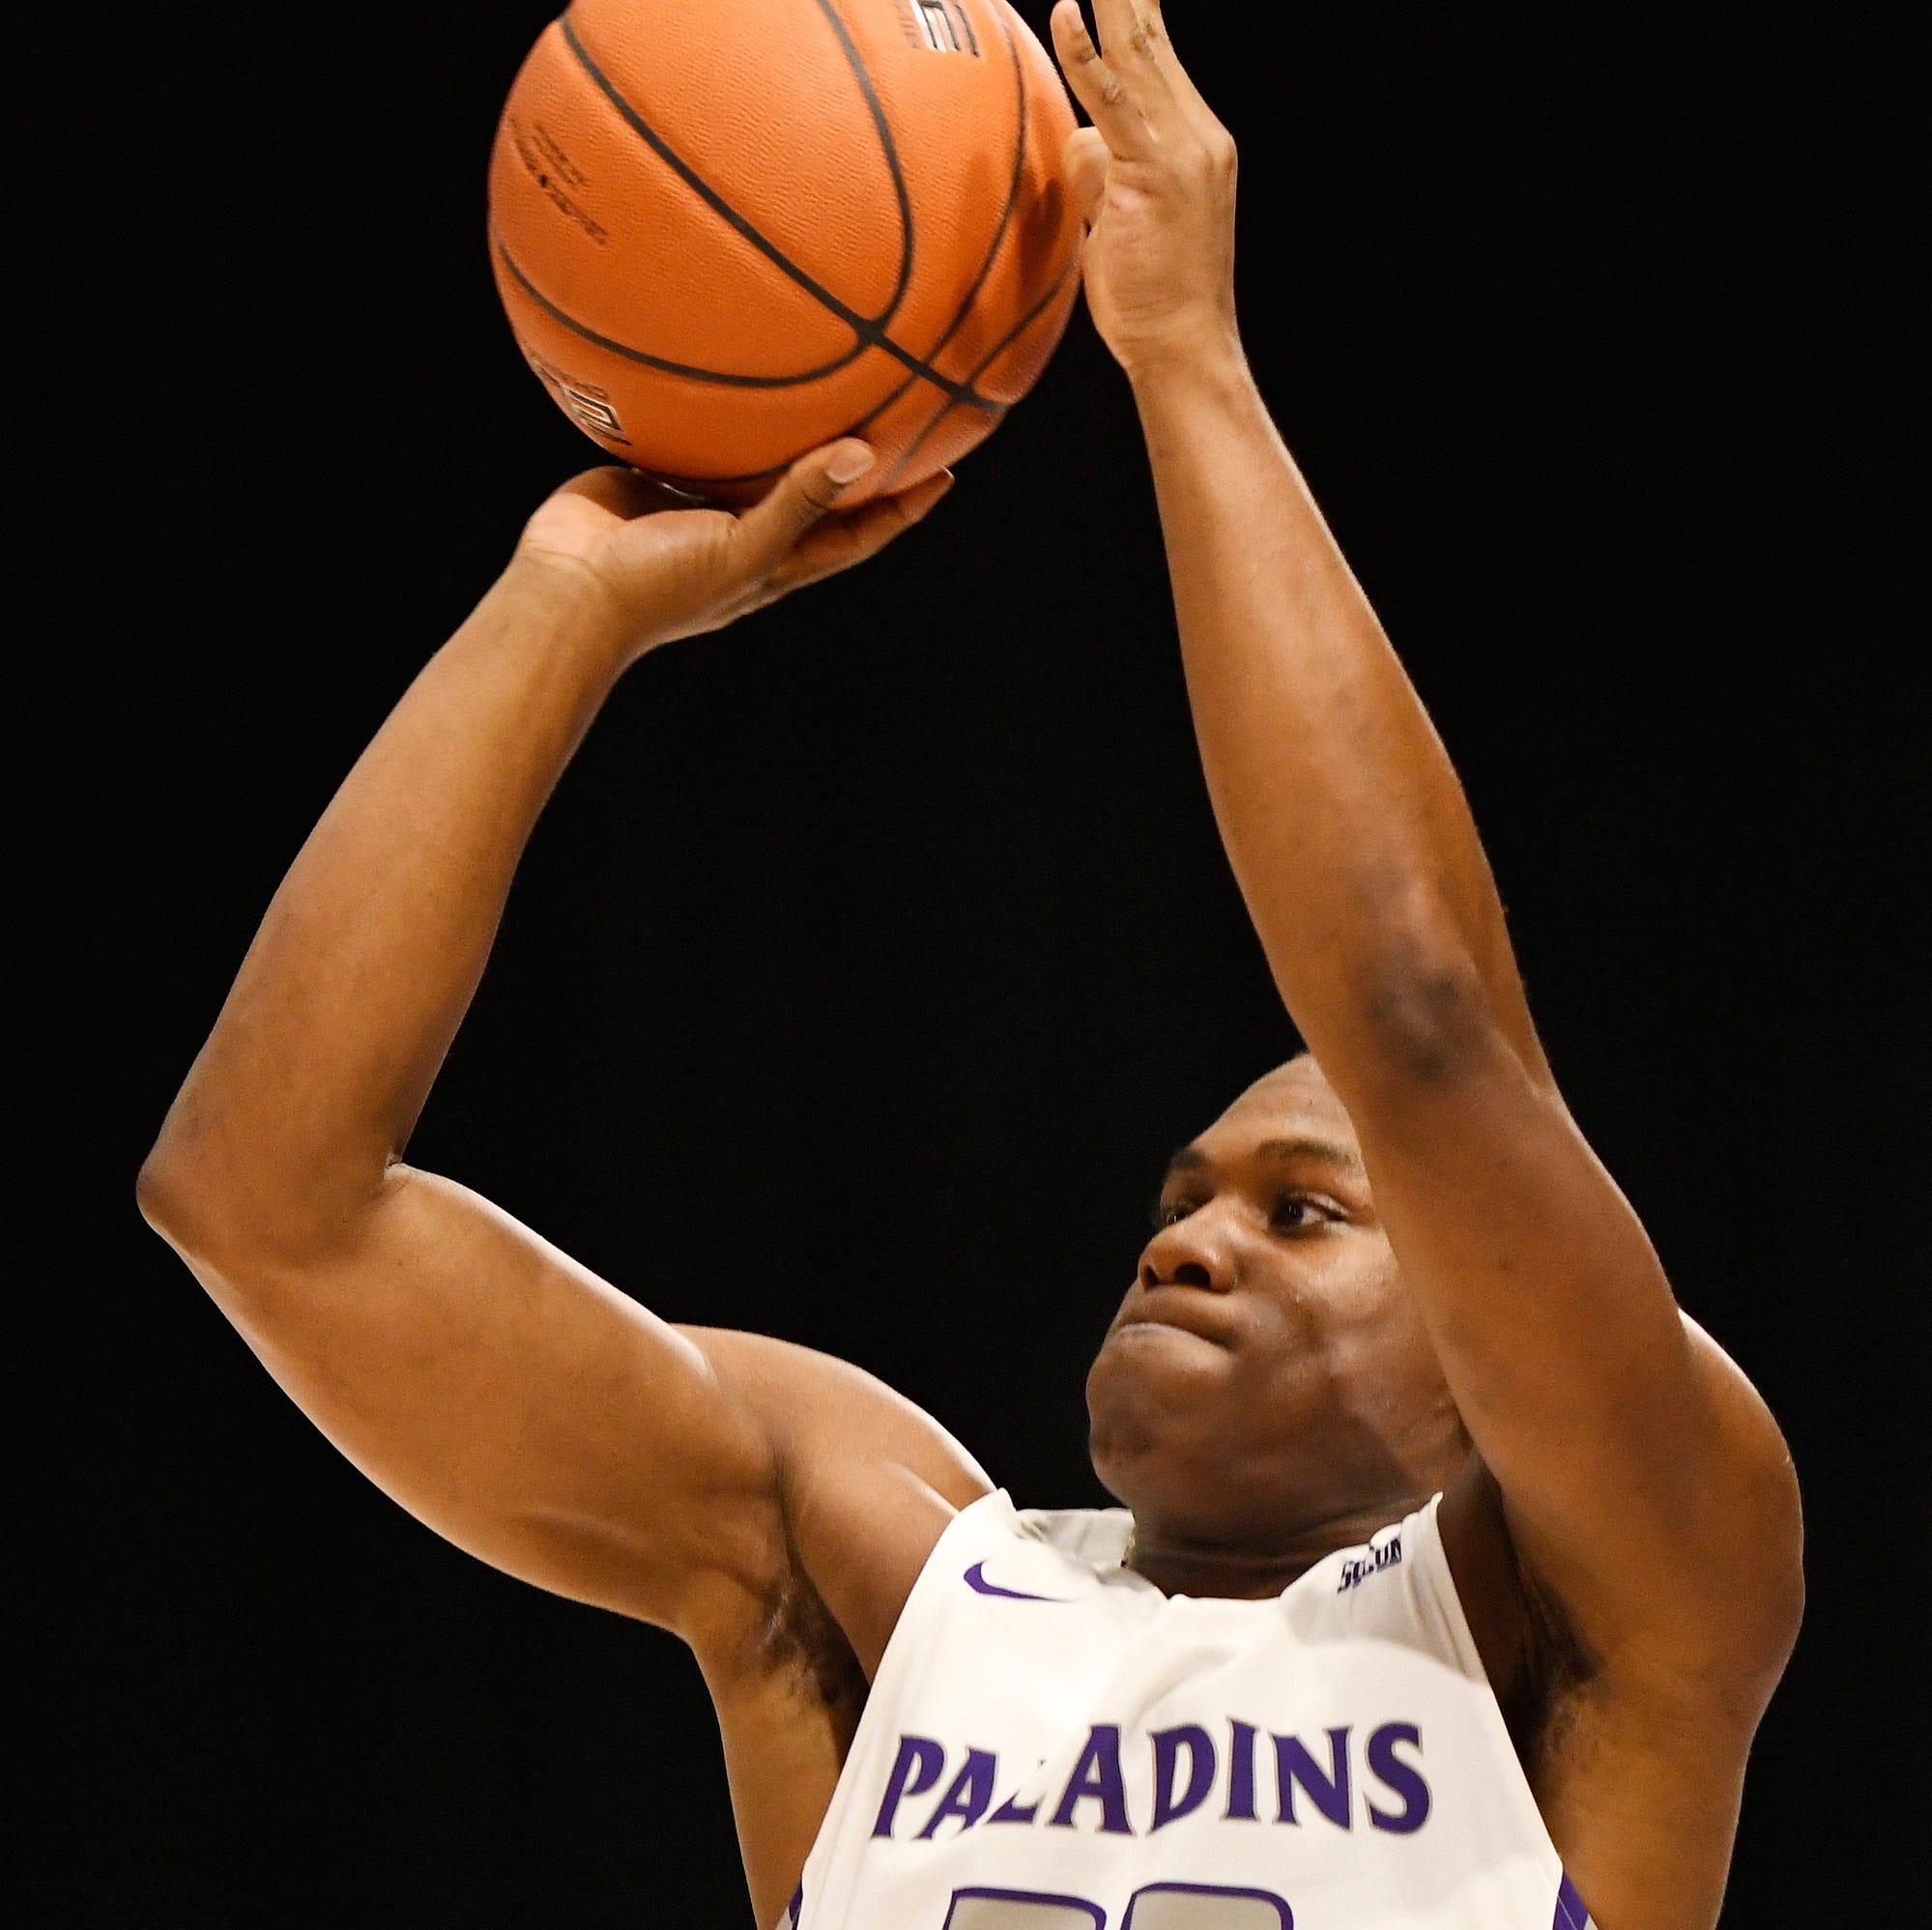 Furman basketball's Jordan Lyons ties NCAA record for 3-pointers